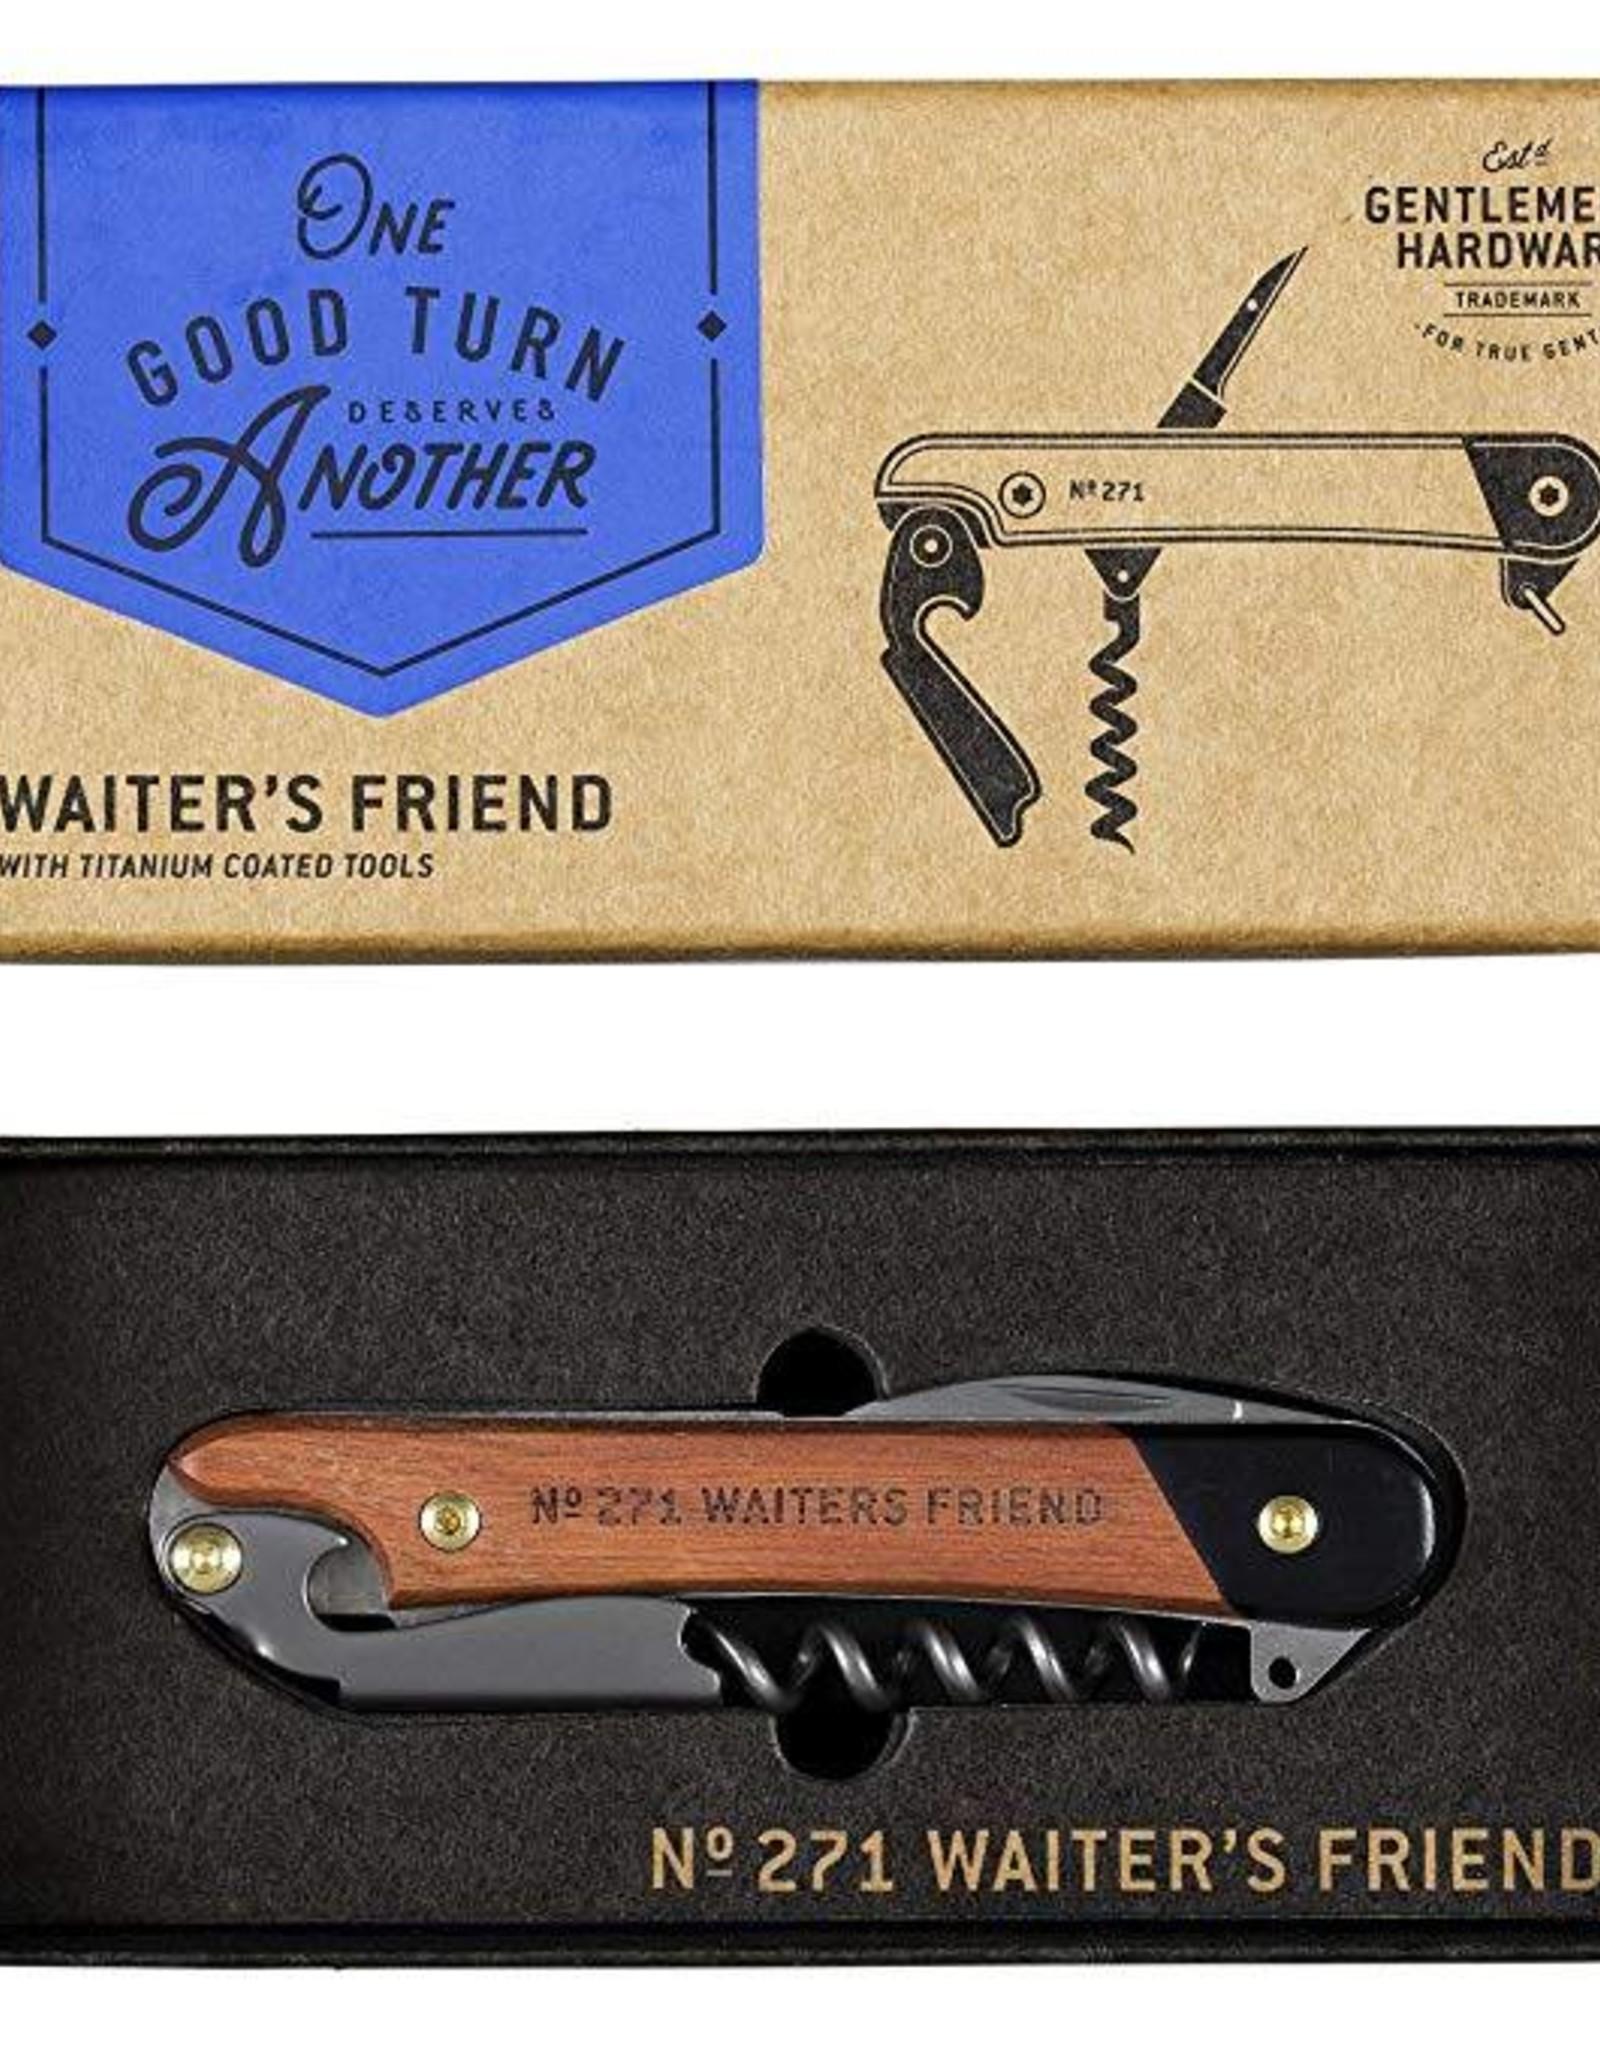 Gentlemen's hardware Gentlemens's hardware - Bicycle repair kit